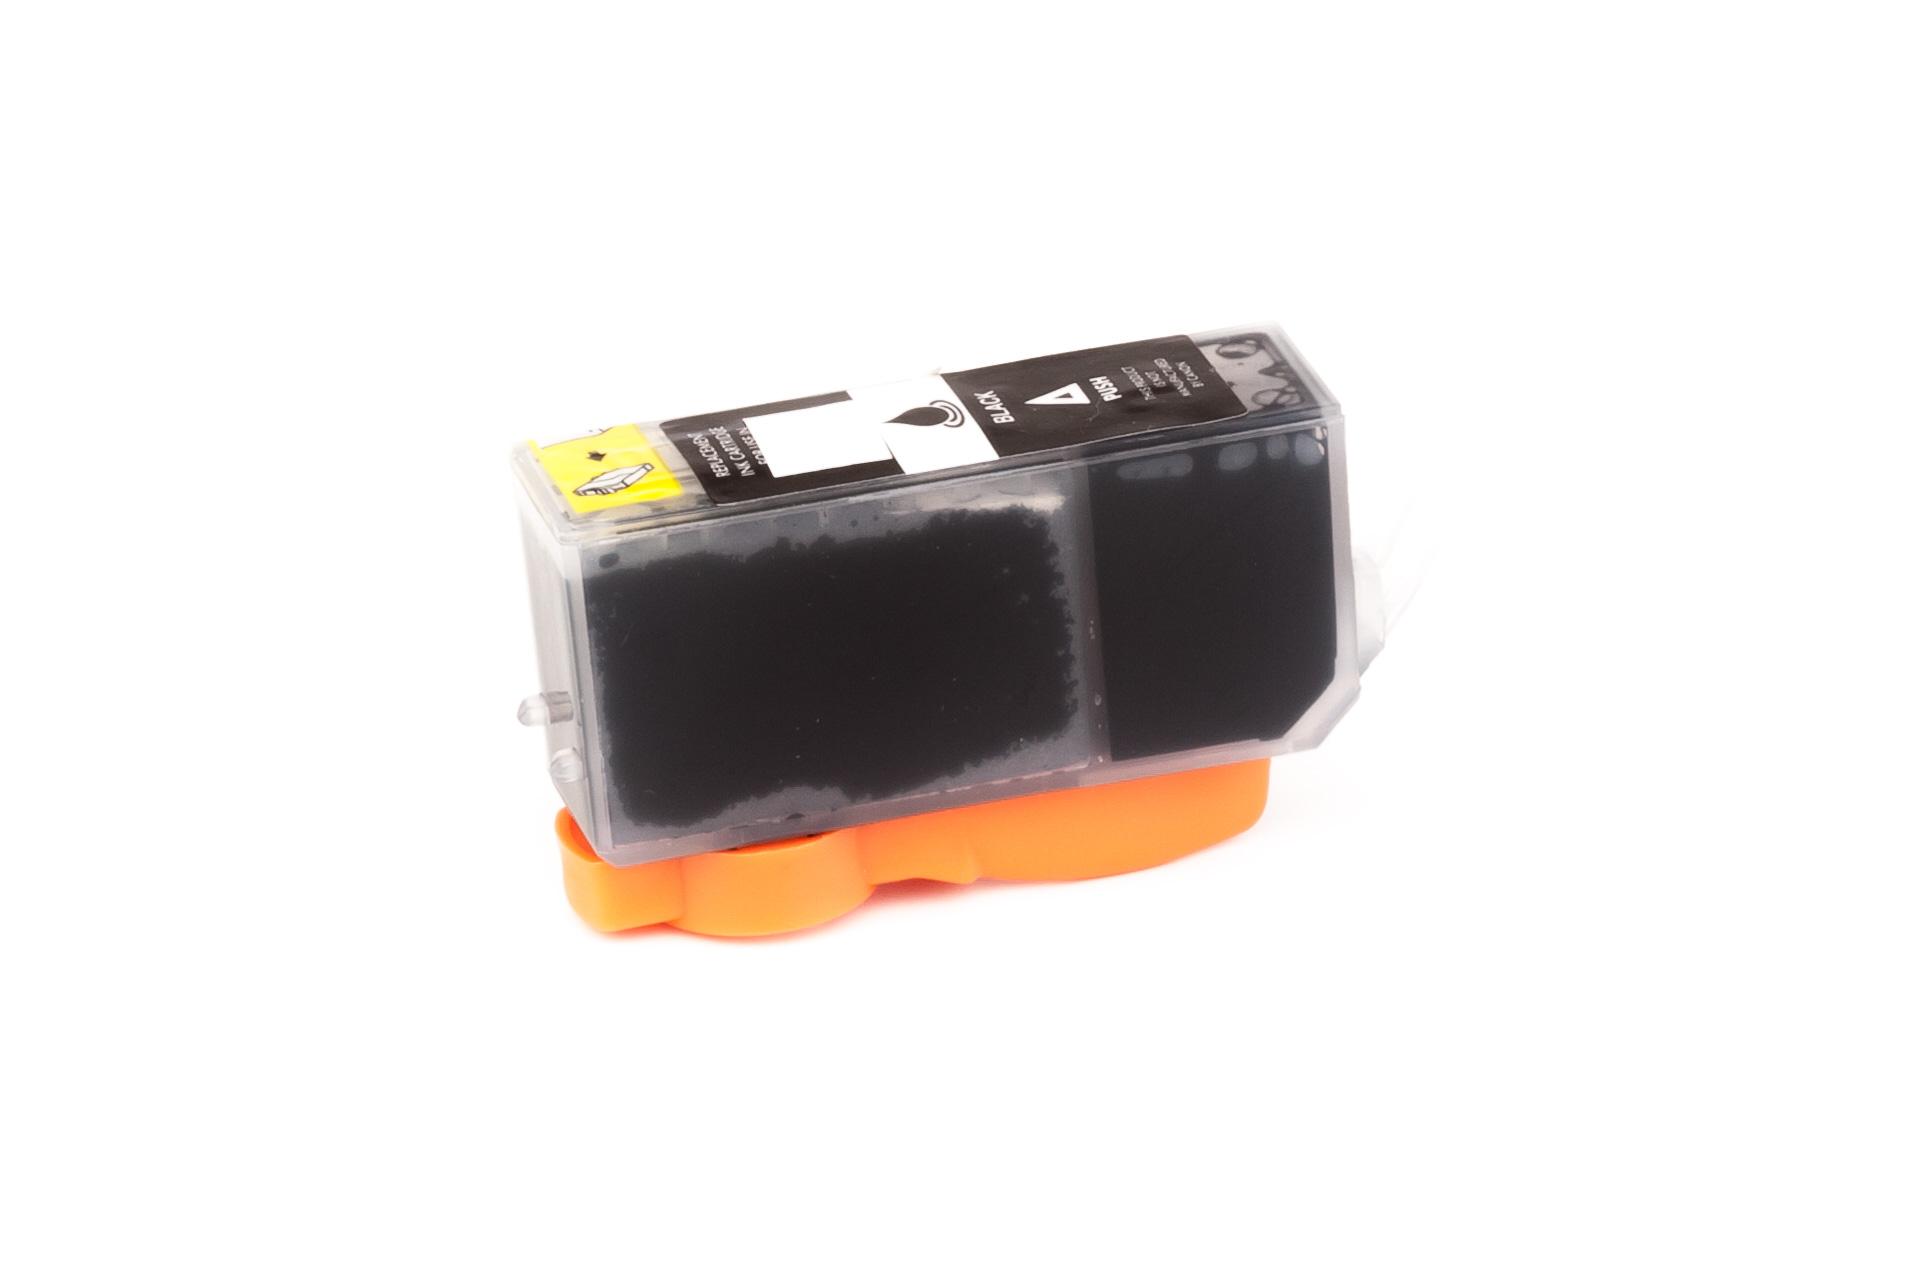 ASC-Premium-Tintenpatrone für Canon Pixma IP 3600 schwarz Pixma IP 3600 PixmaIP3600